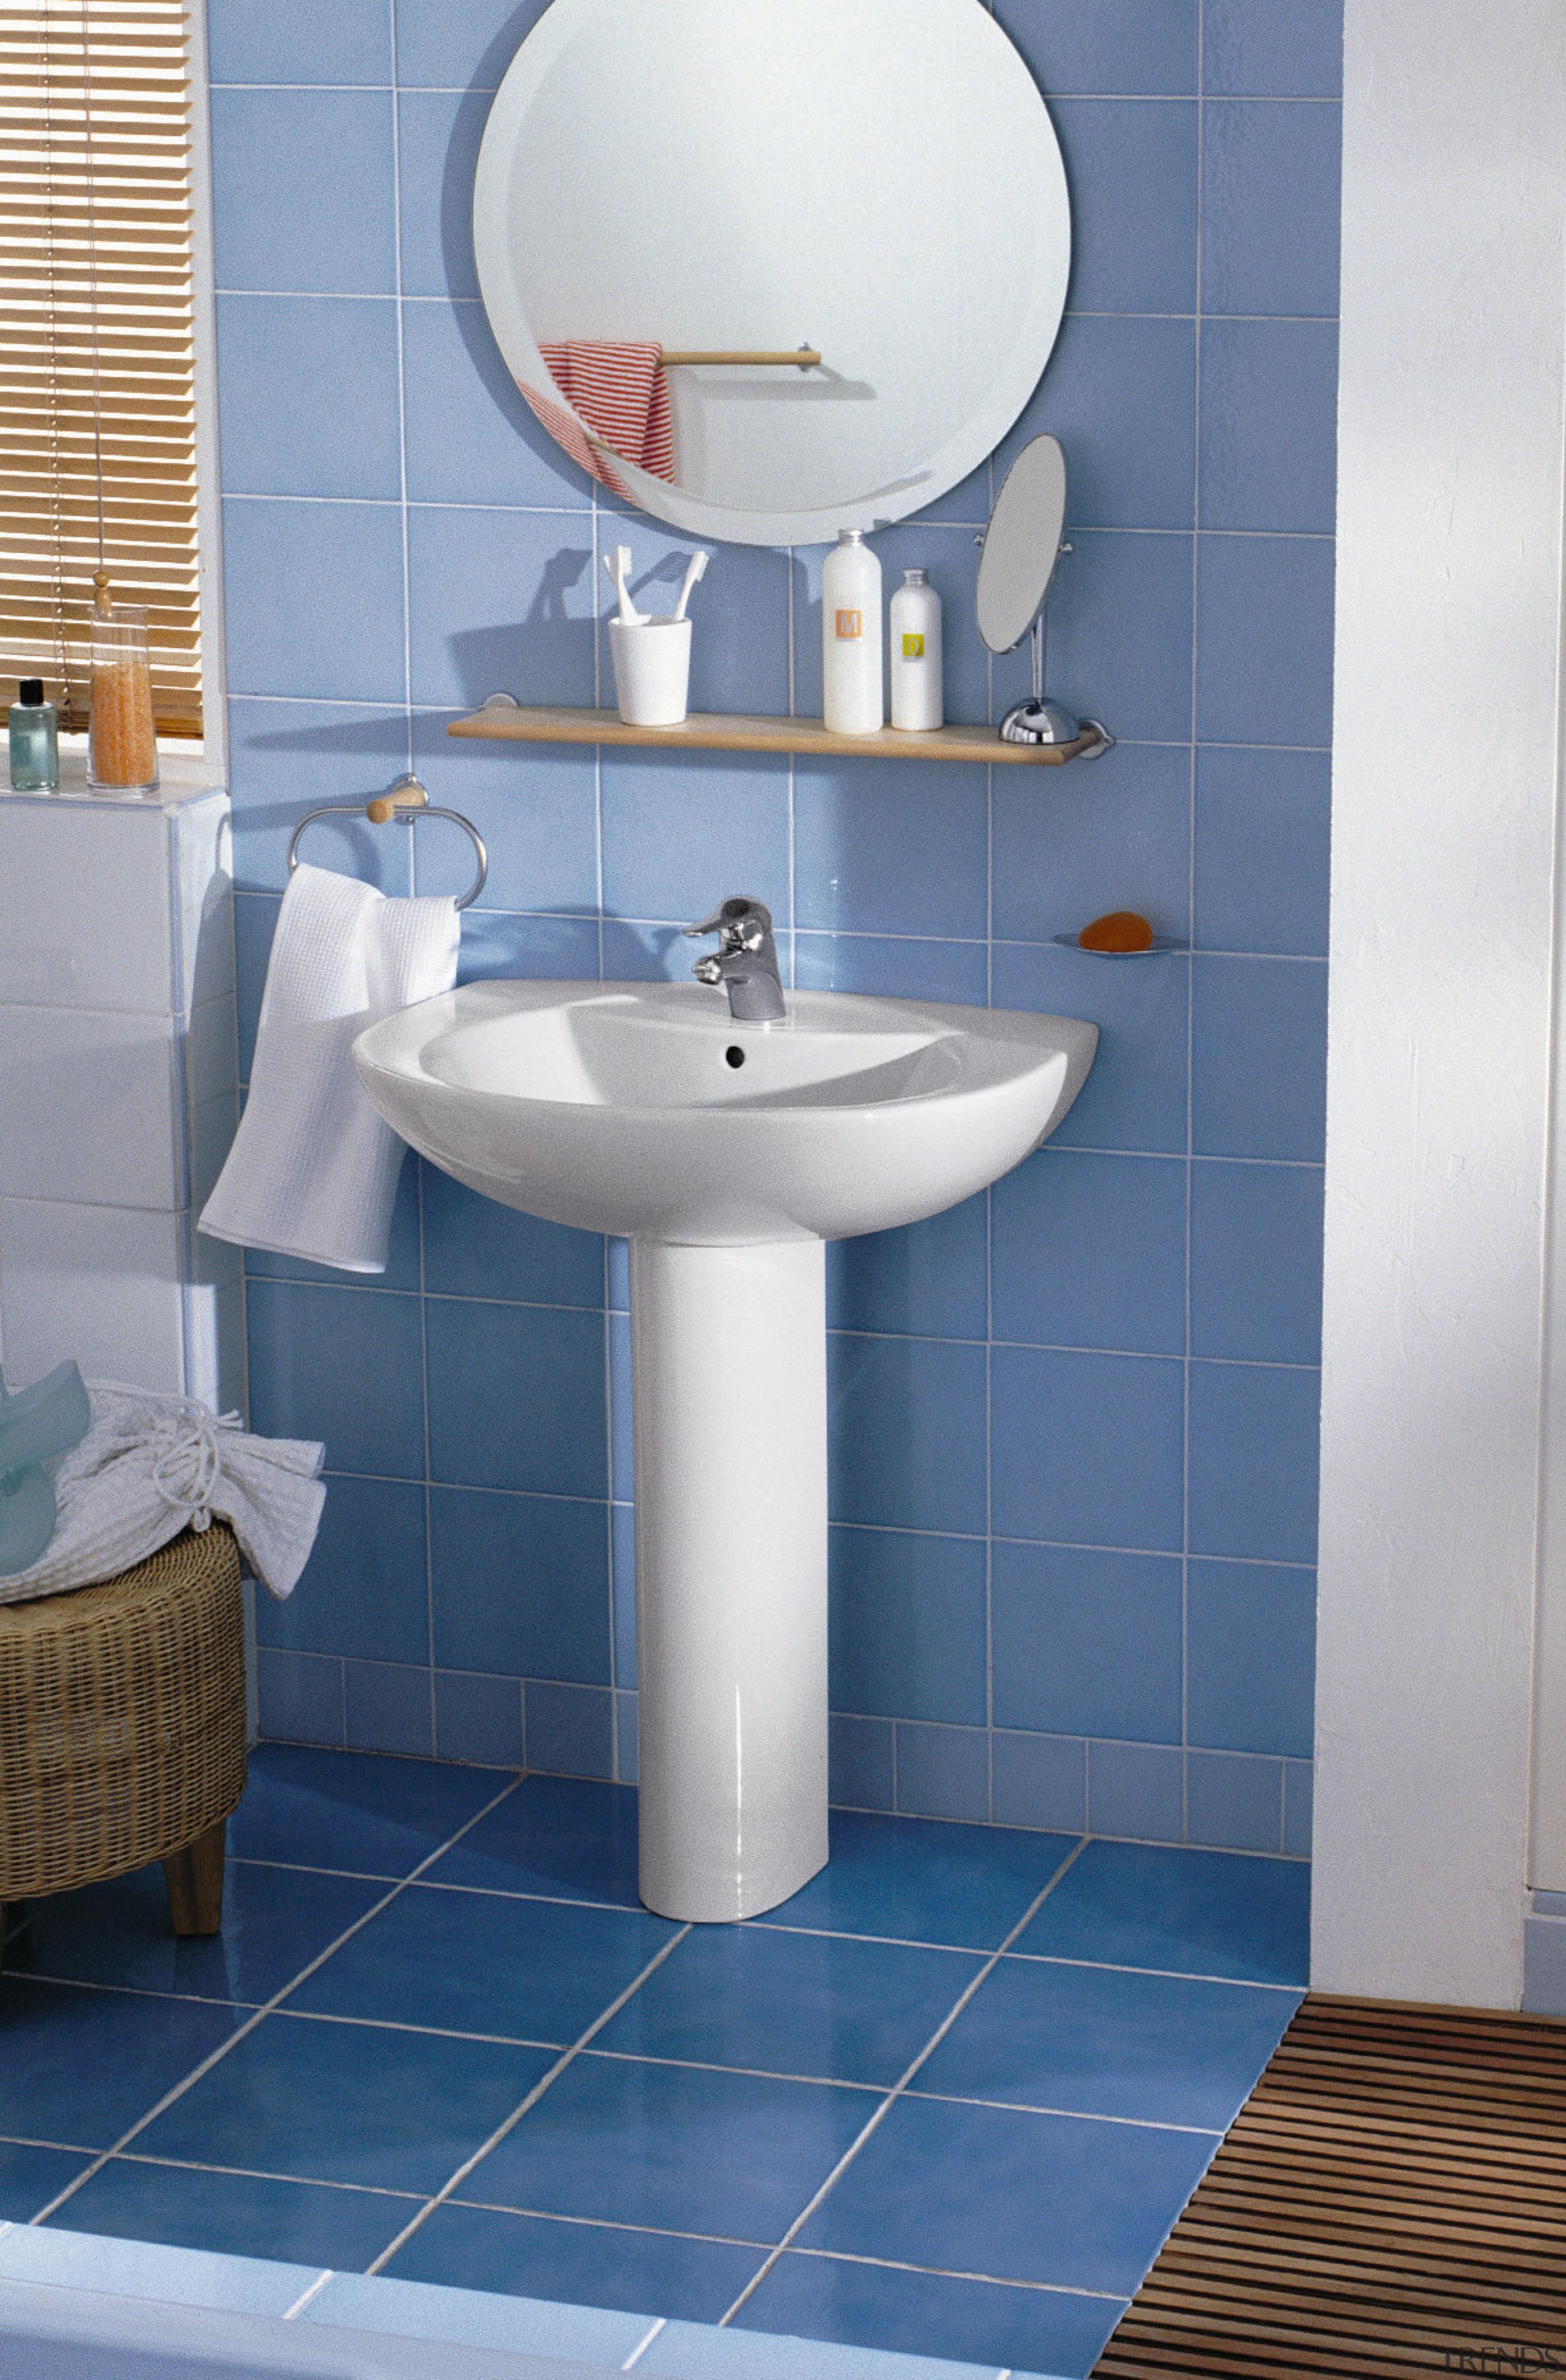 Bathroom with blue floor and wall tiles, white angle, bathroom, bathroom accessory, bathroom sink, ceramic, floor, flooring, interior design, plumbing fixture, product, product design, public toilet, room, sink, tap, tile, toilet, toilet seat, wall, blue, gray